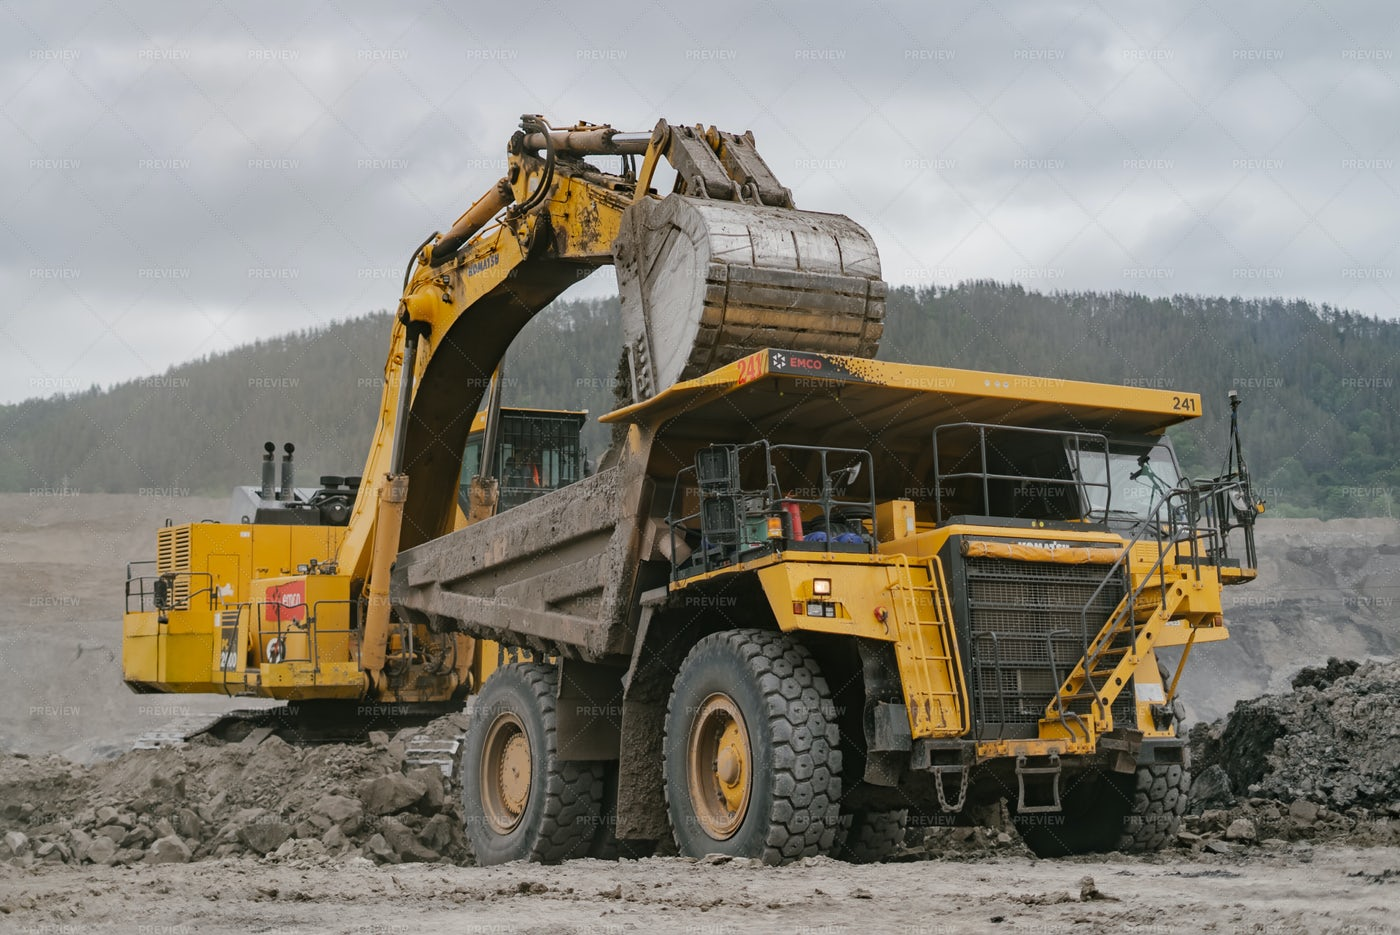 An Excavator Loads Ore Into A Dump Truck: Stock Photos